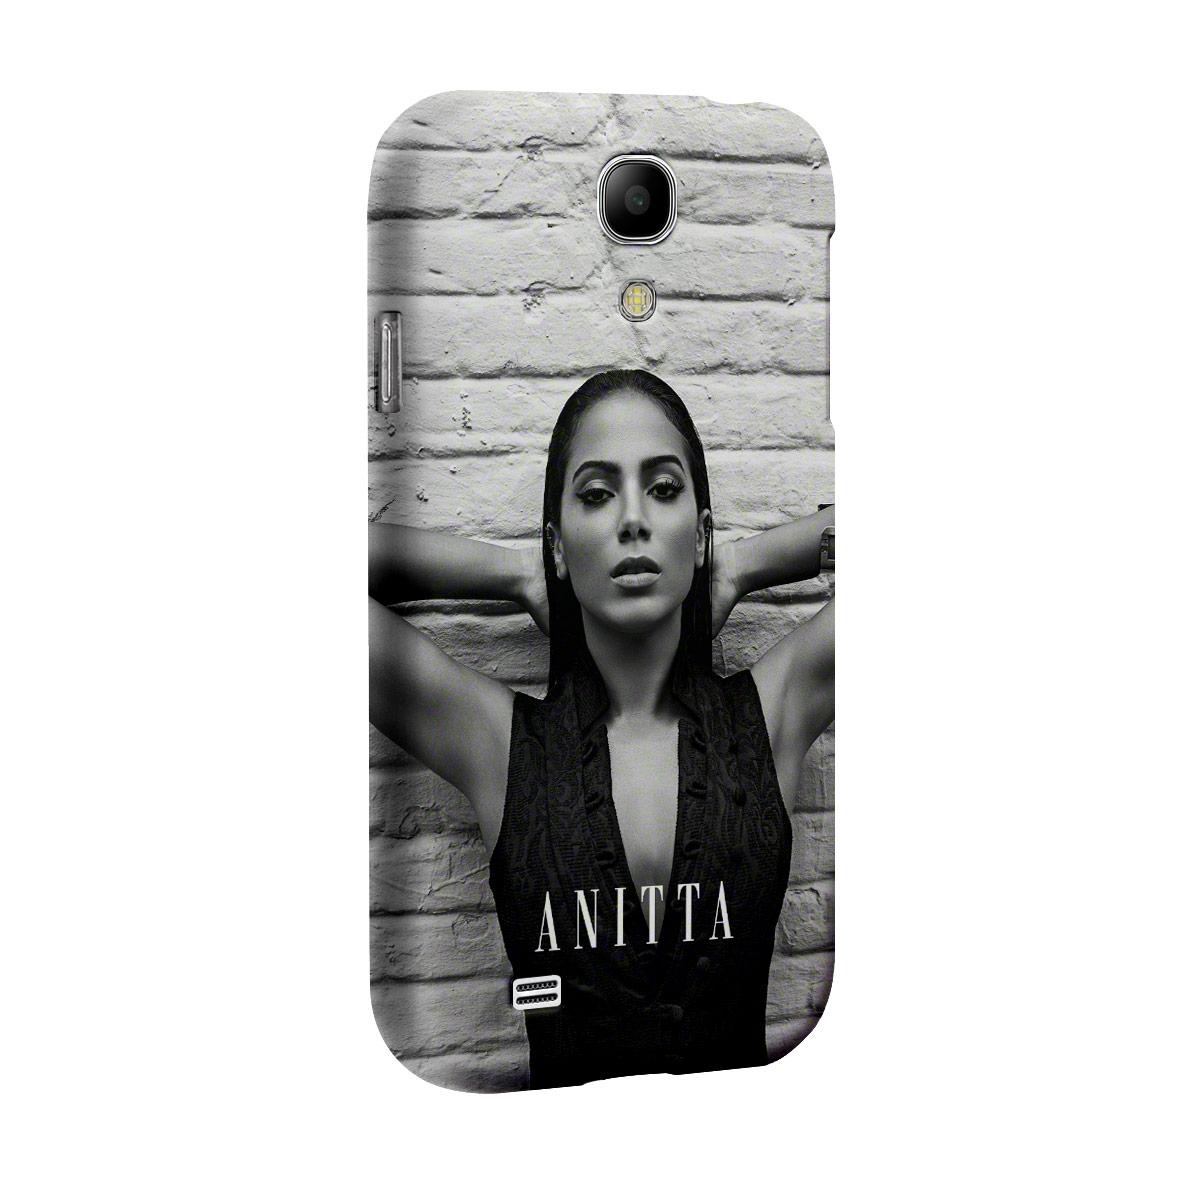 Capa para Samsung Galaxy S4 Anitta P&B